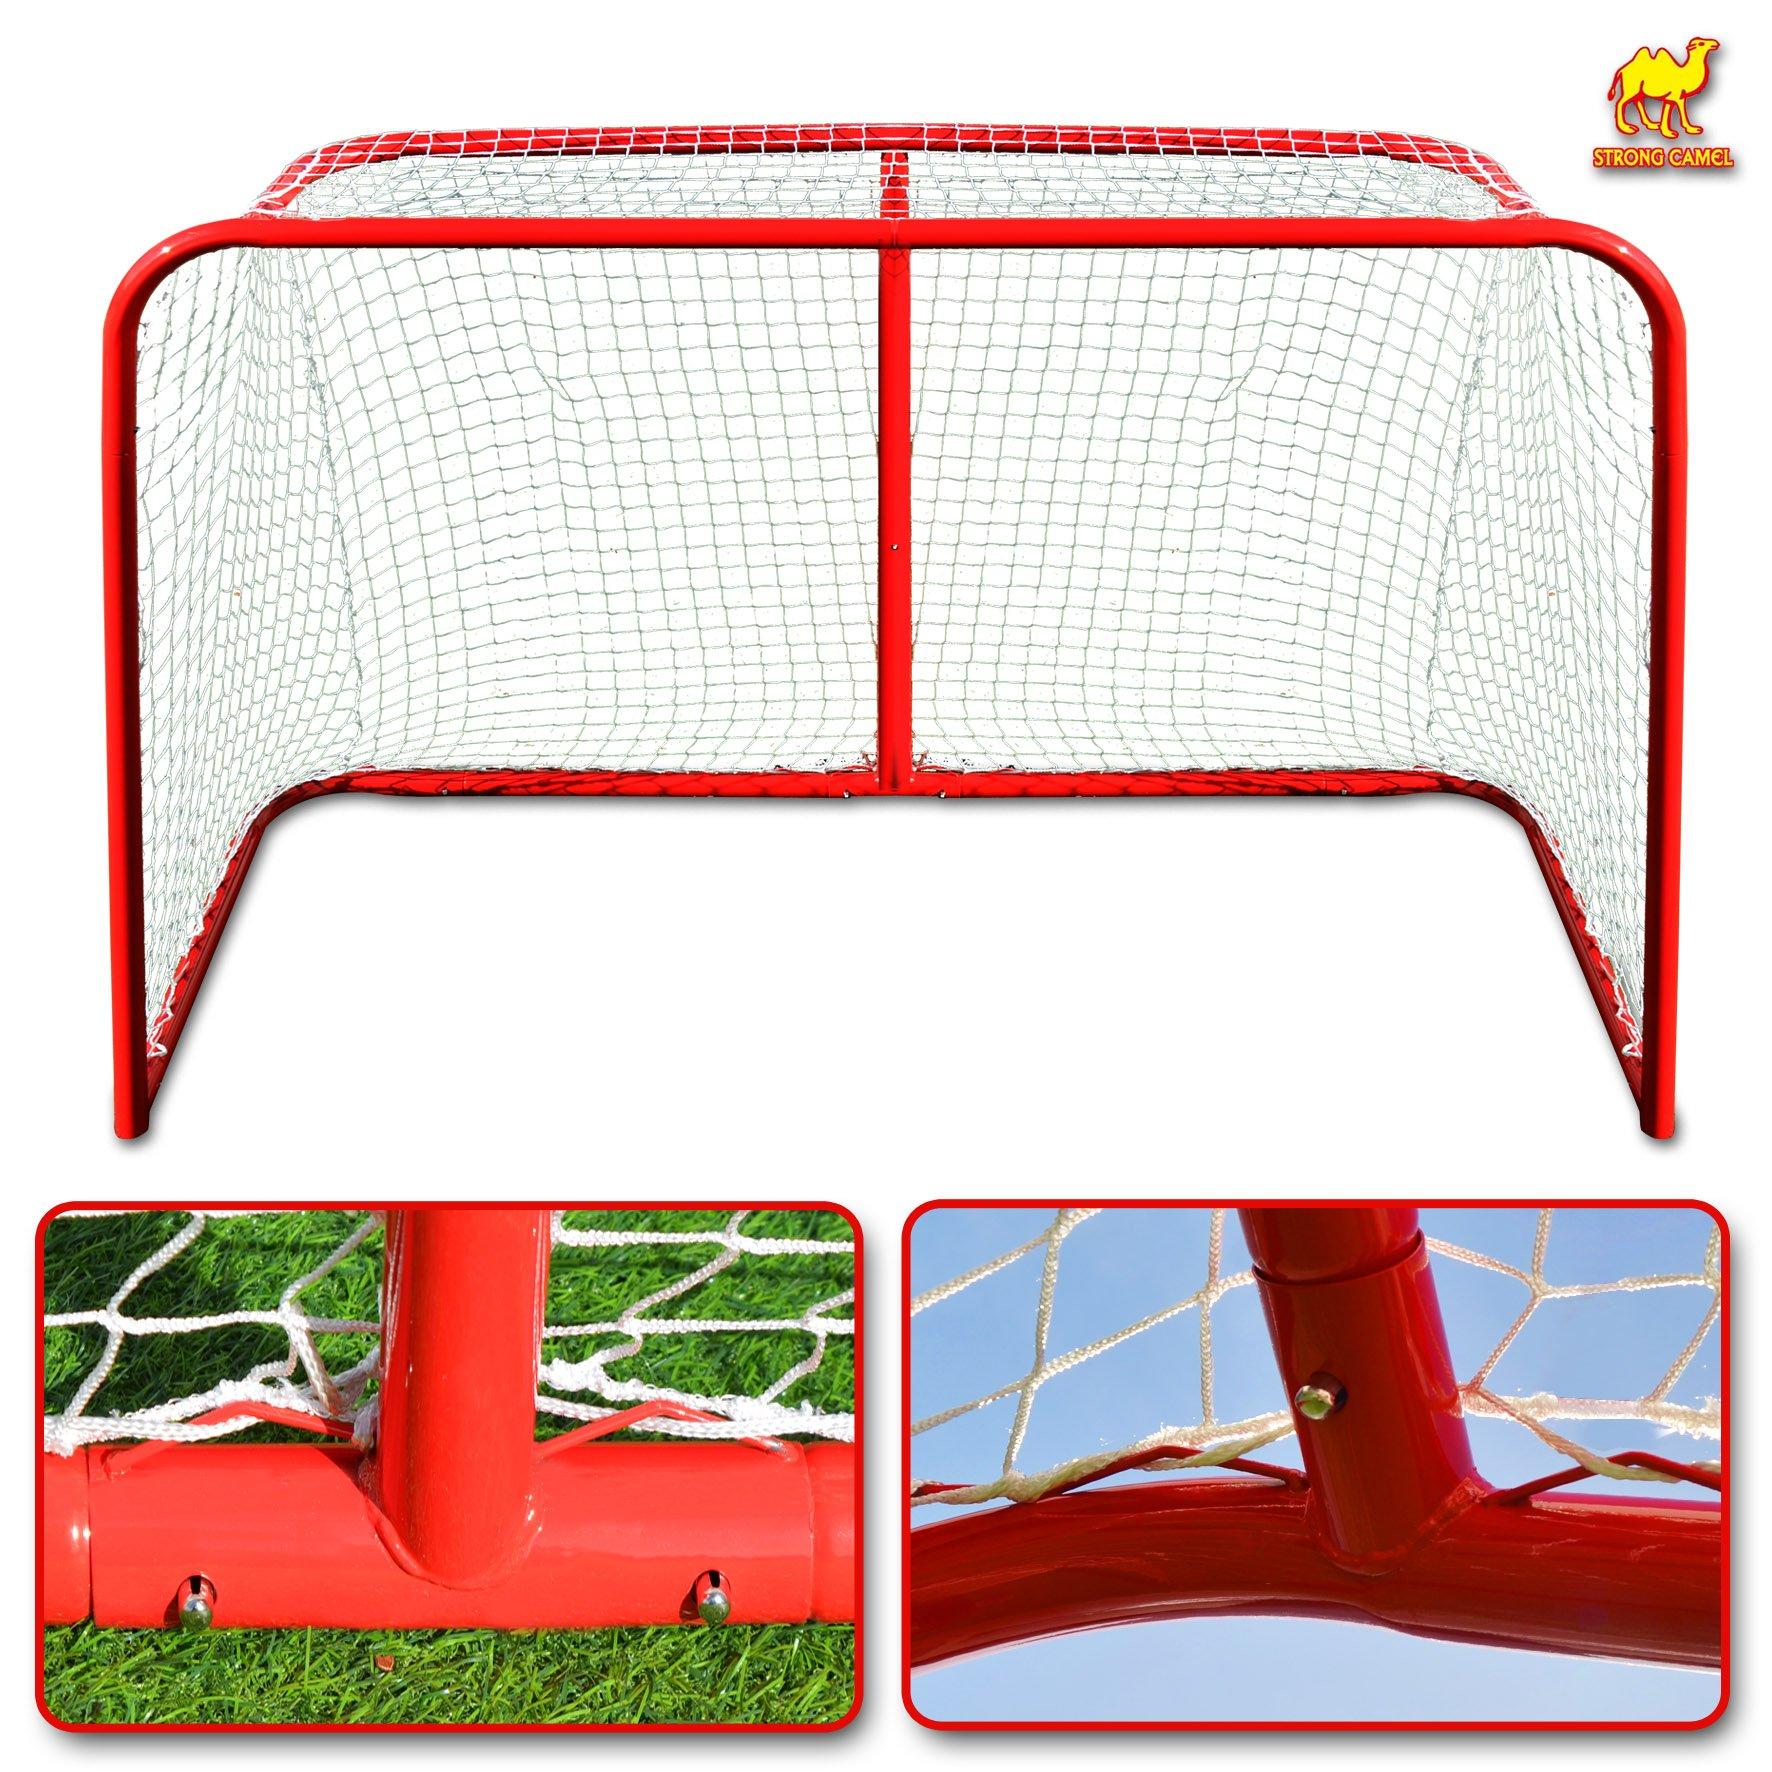 Strong Camel Senior Hockey Elite Goal With Steel Tubing 72'' x 48'' x 32'' (4 x 6-Feet) Regulation Net